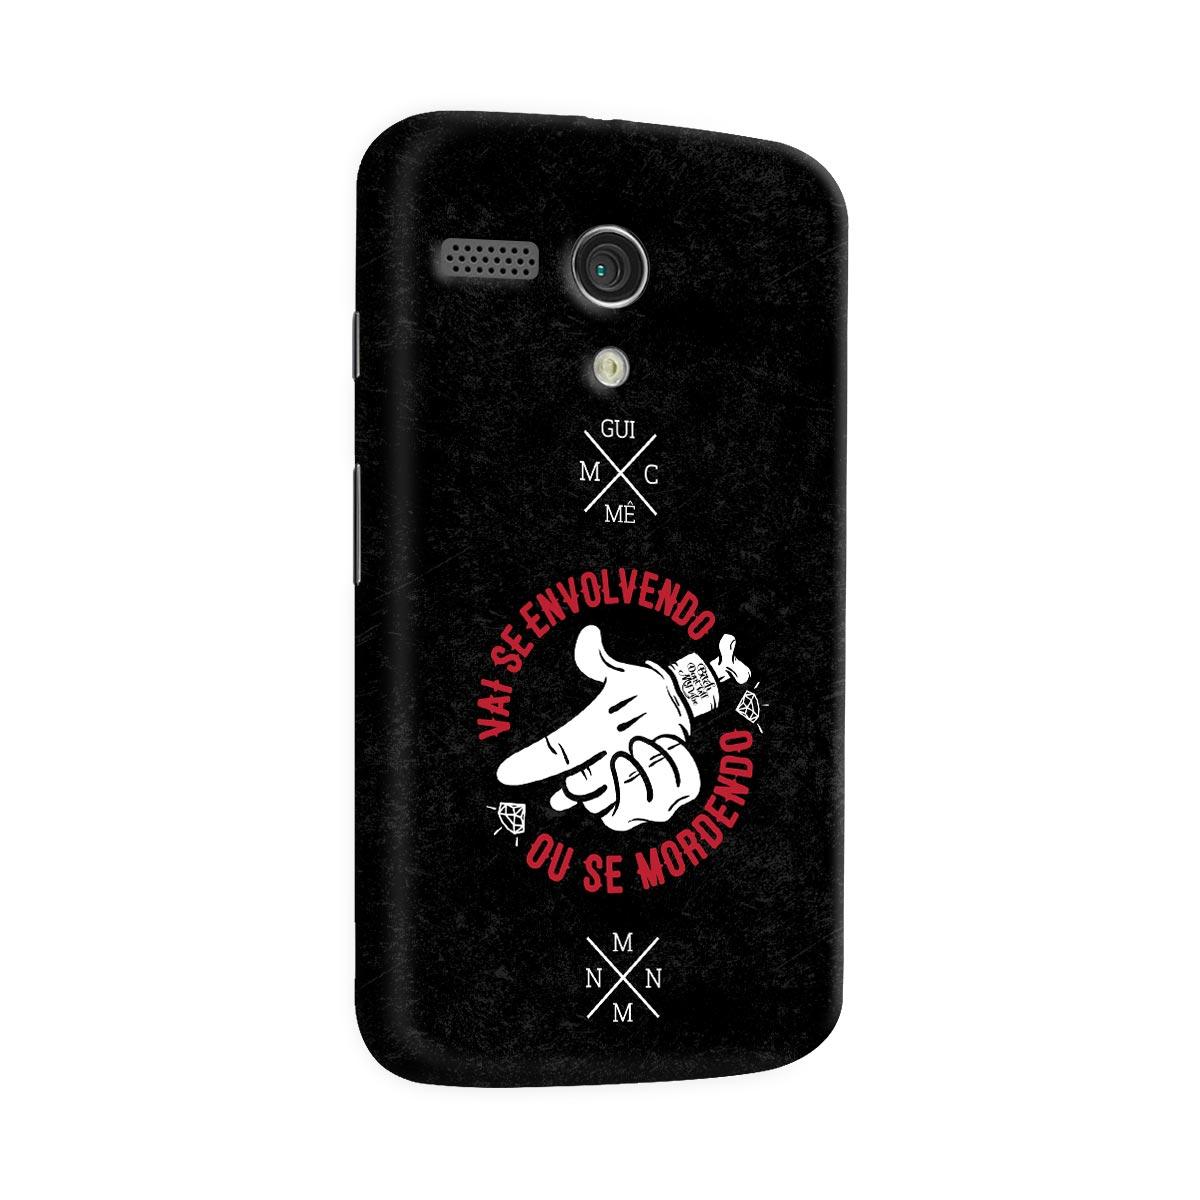 Capa para Motorola Moto G 1 MC Guim� Vai Se Envolvendo